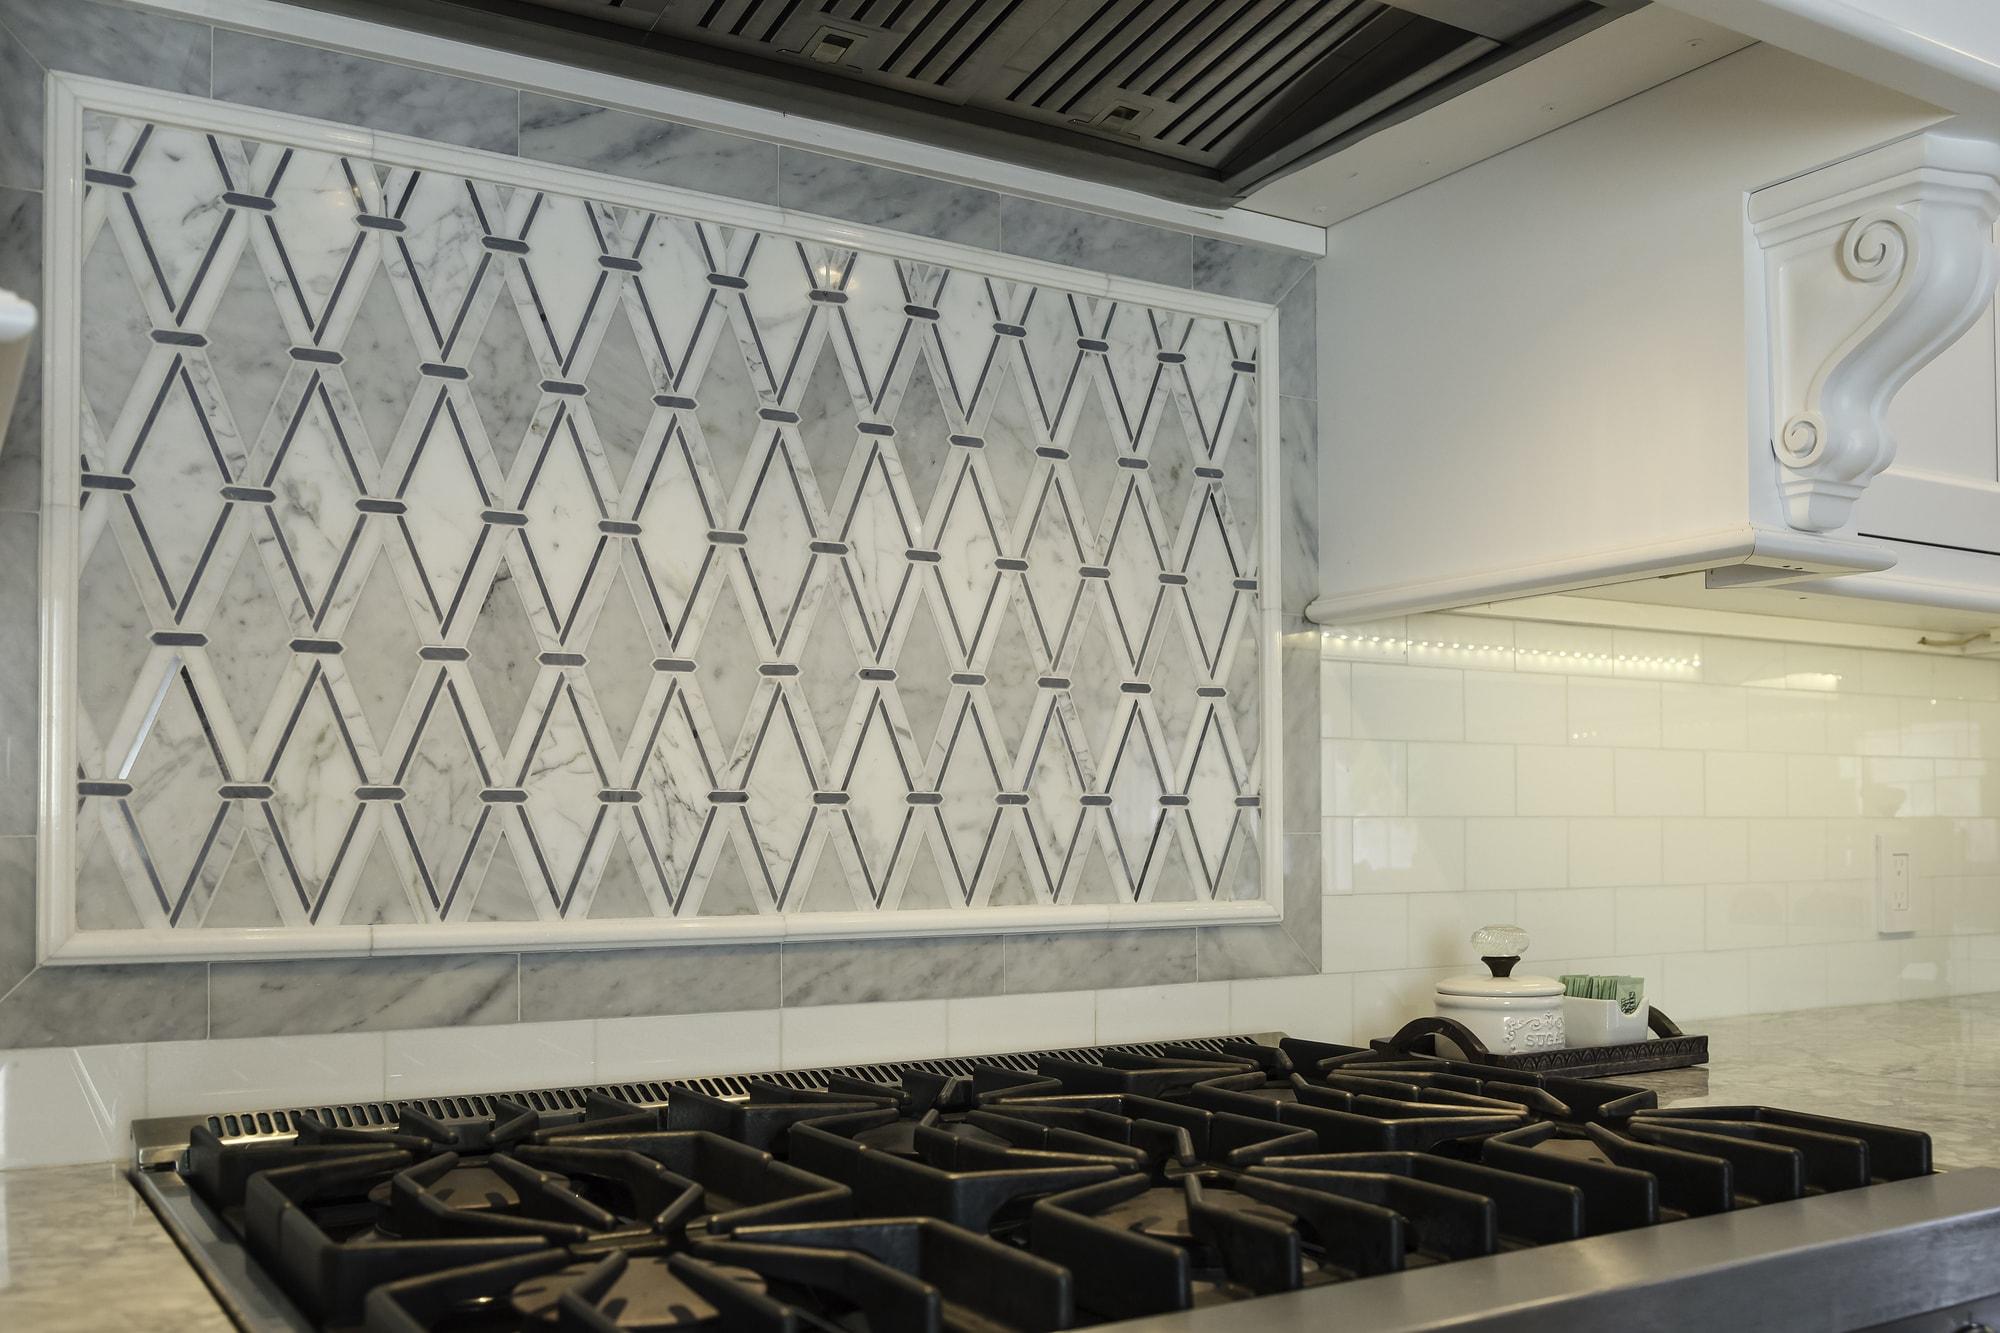 Transitional style kitchen with diamond shaped tiles backsplash